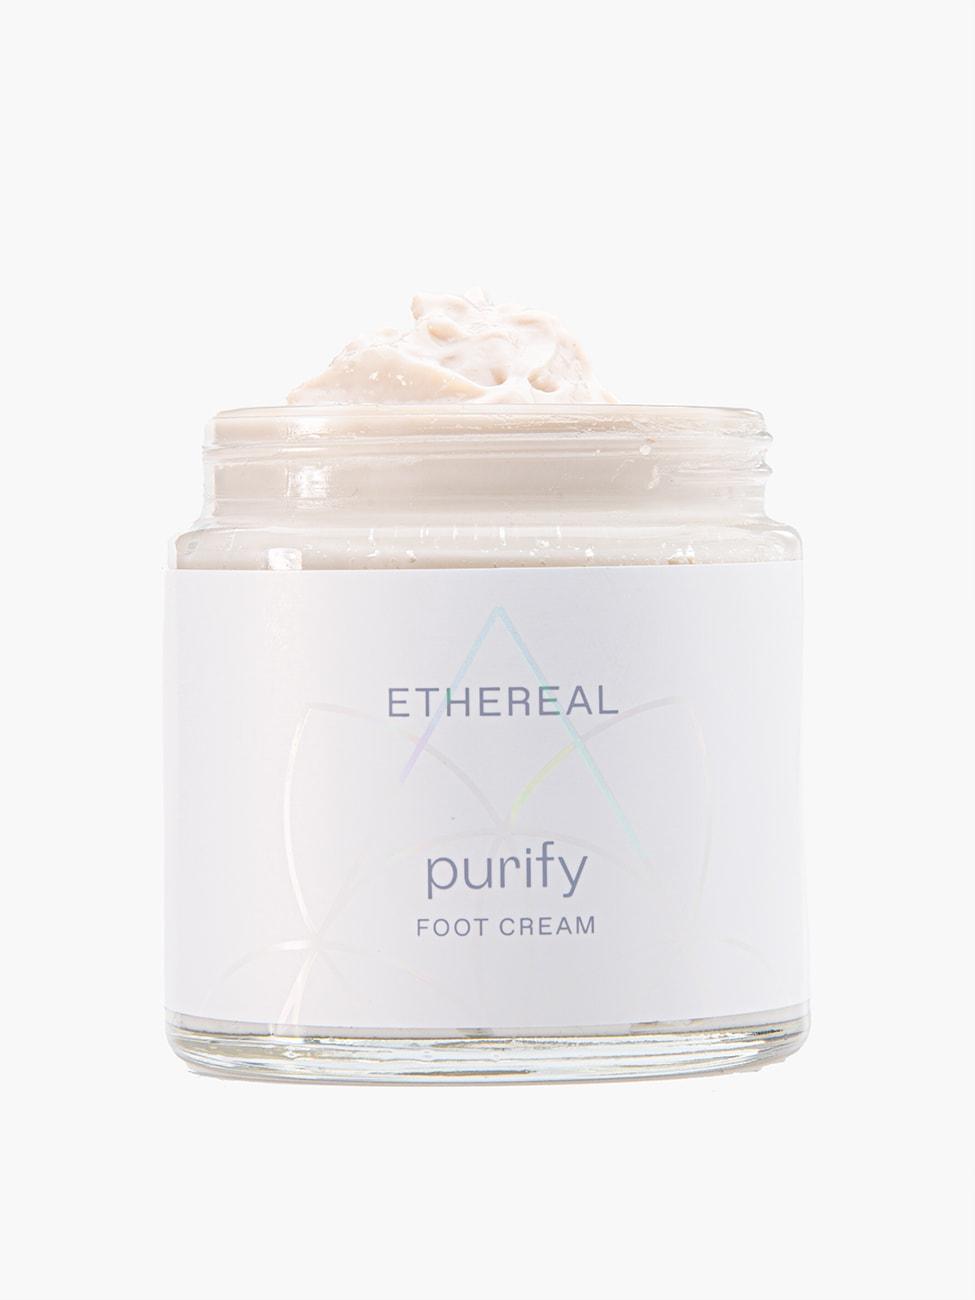 Purify_Cream_Texture_Ethereal_Dermocosmetics_Skincare_Handmade_Greek_Products